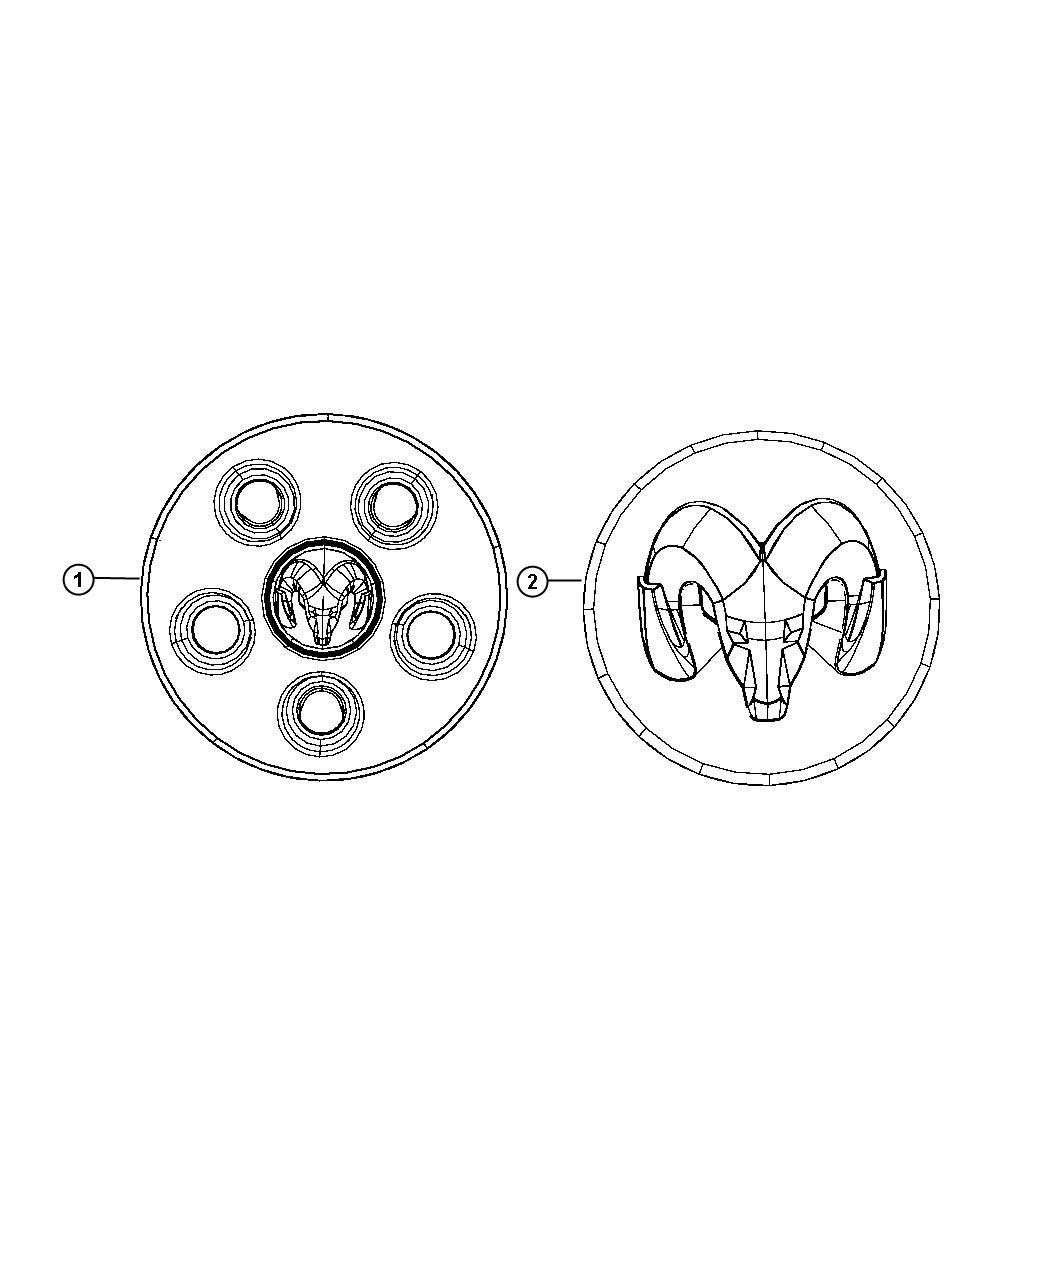 Dodge NITRO Cap. Wheel center. [16x7.0 styled steel wheels